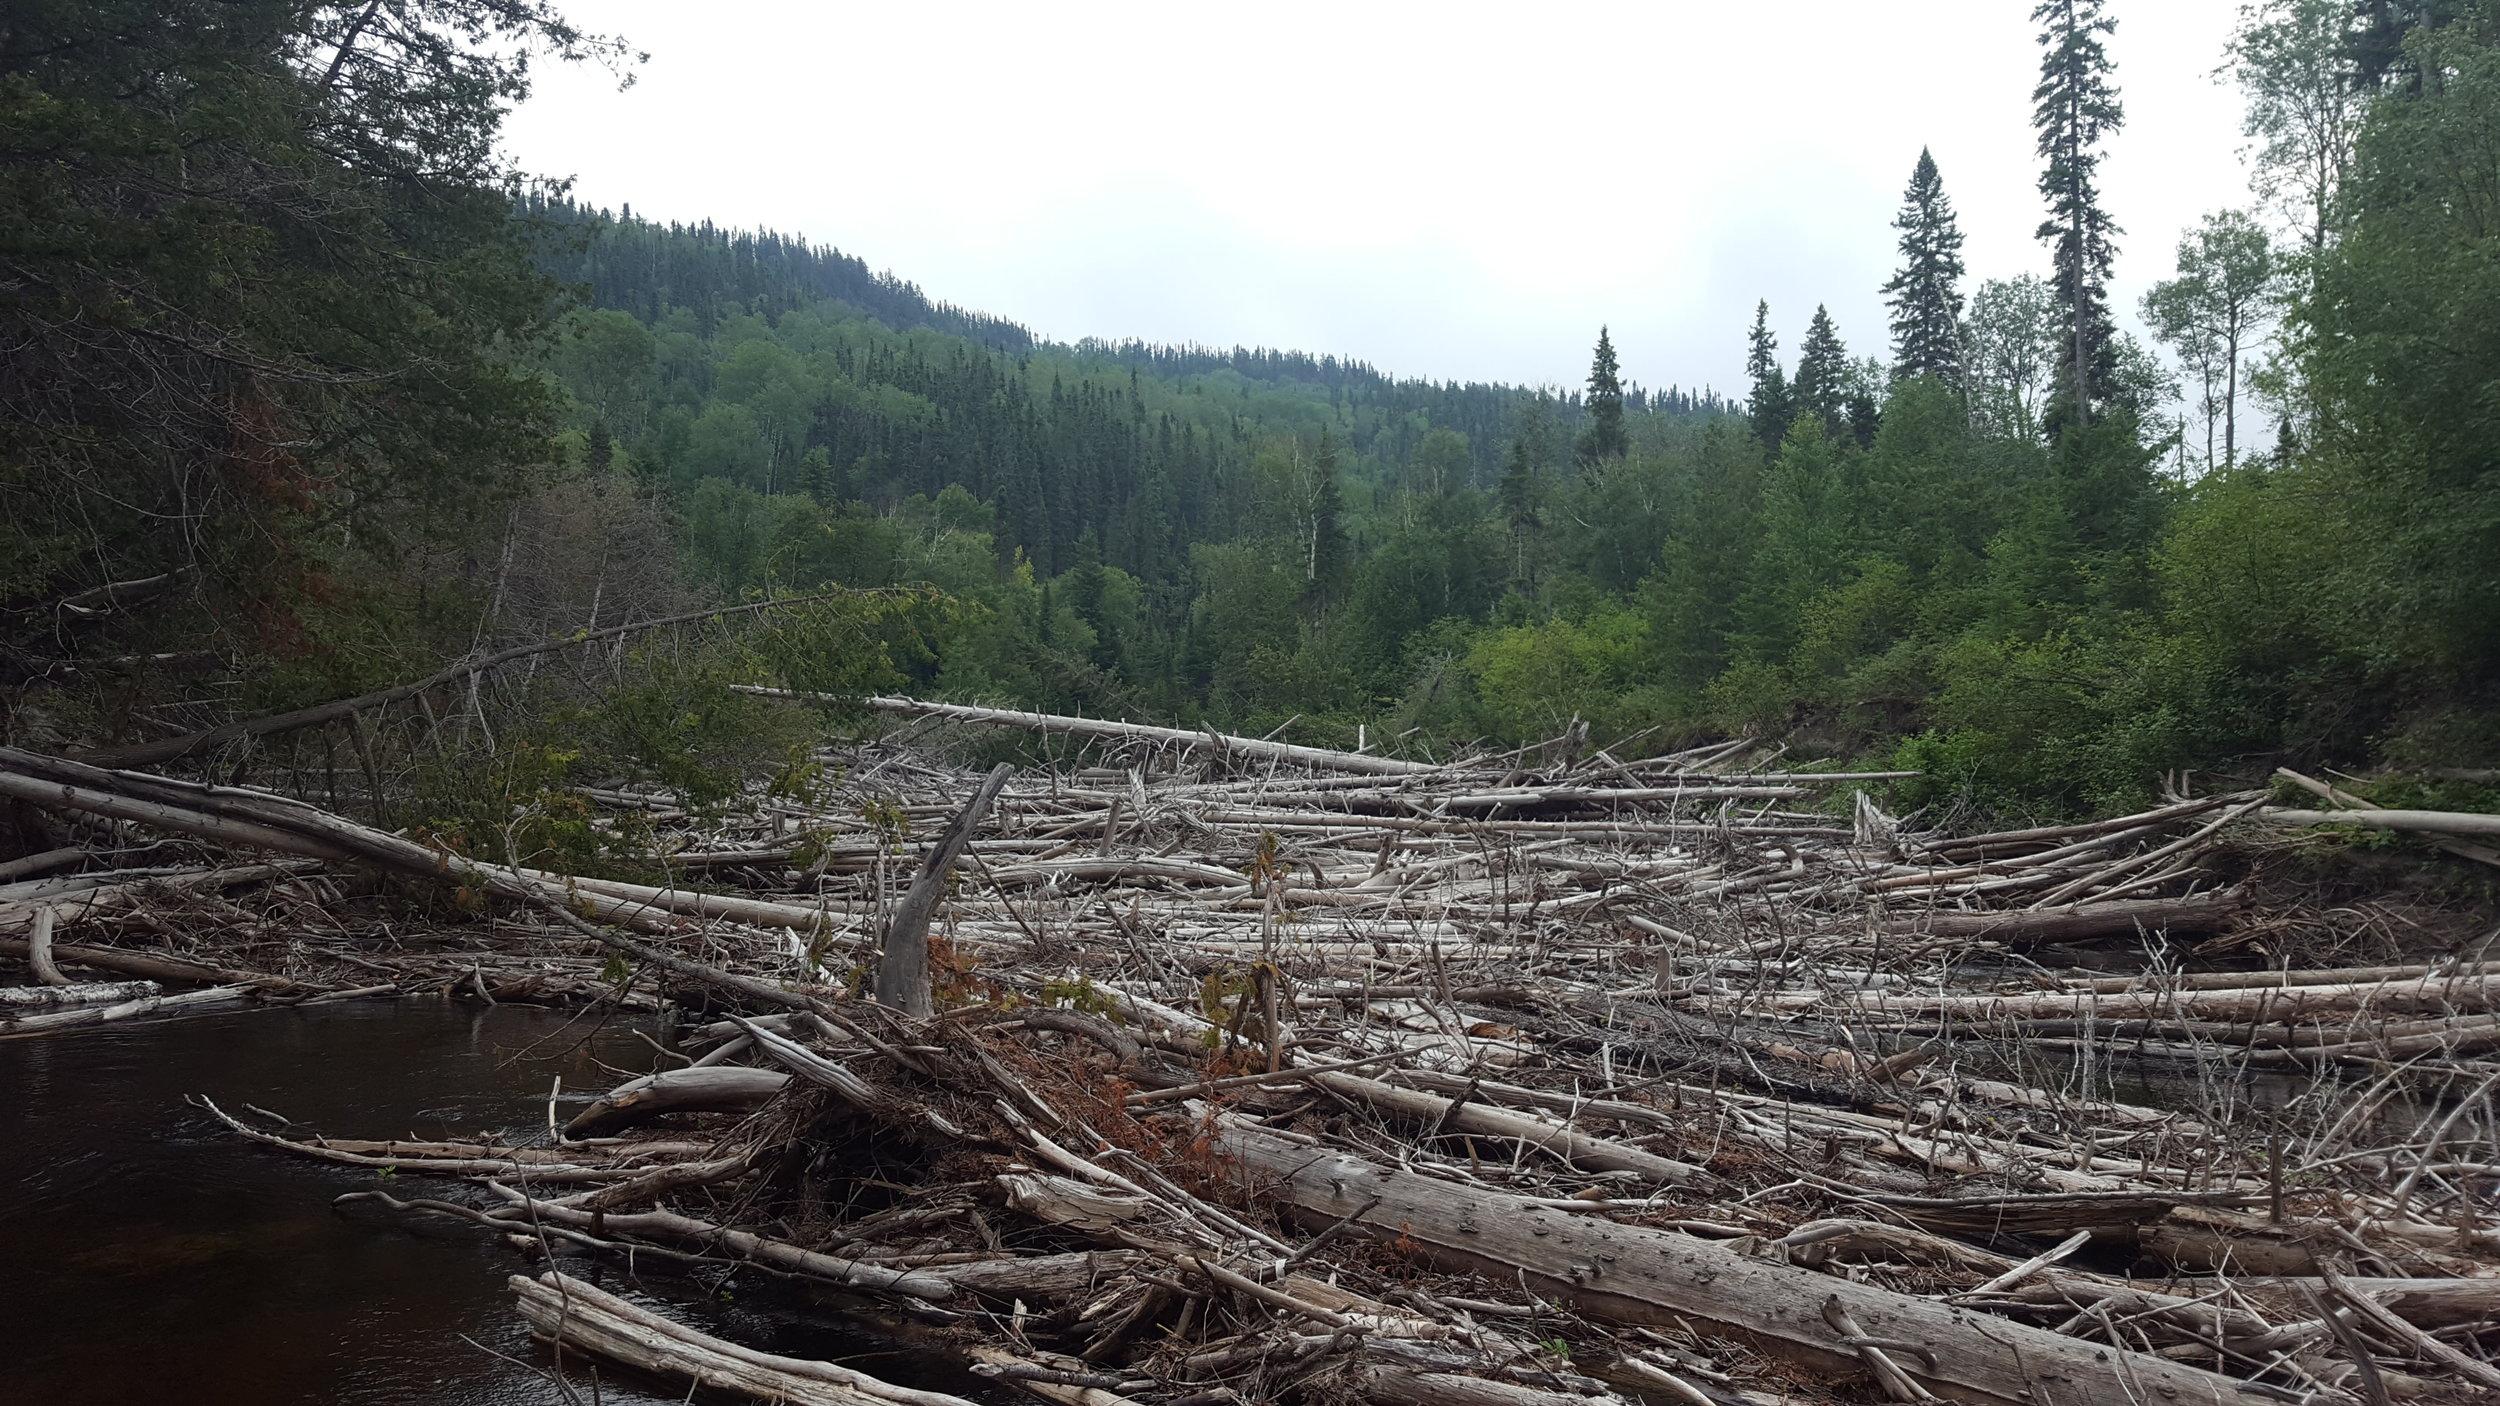 Log Jam on the Steel River